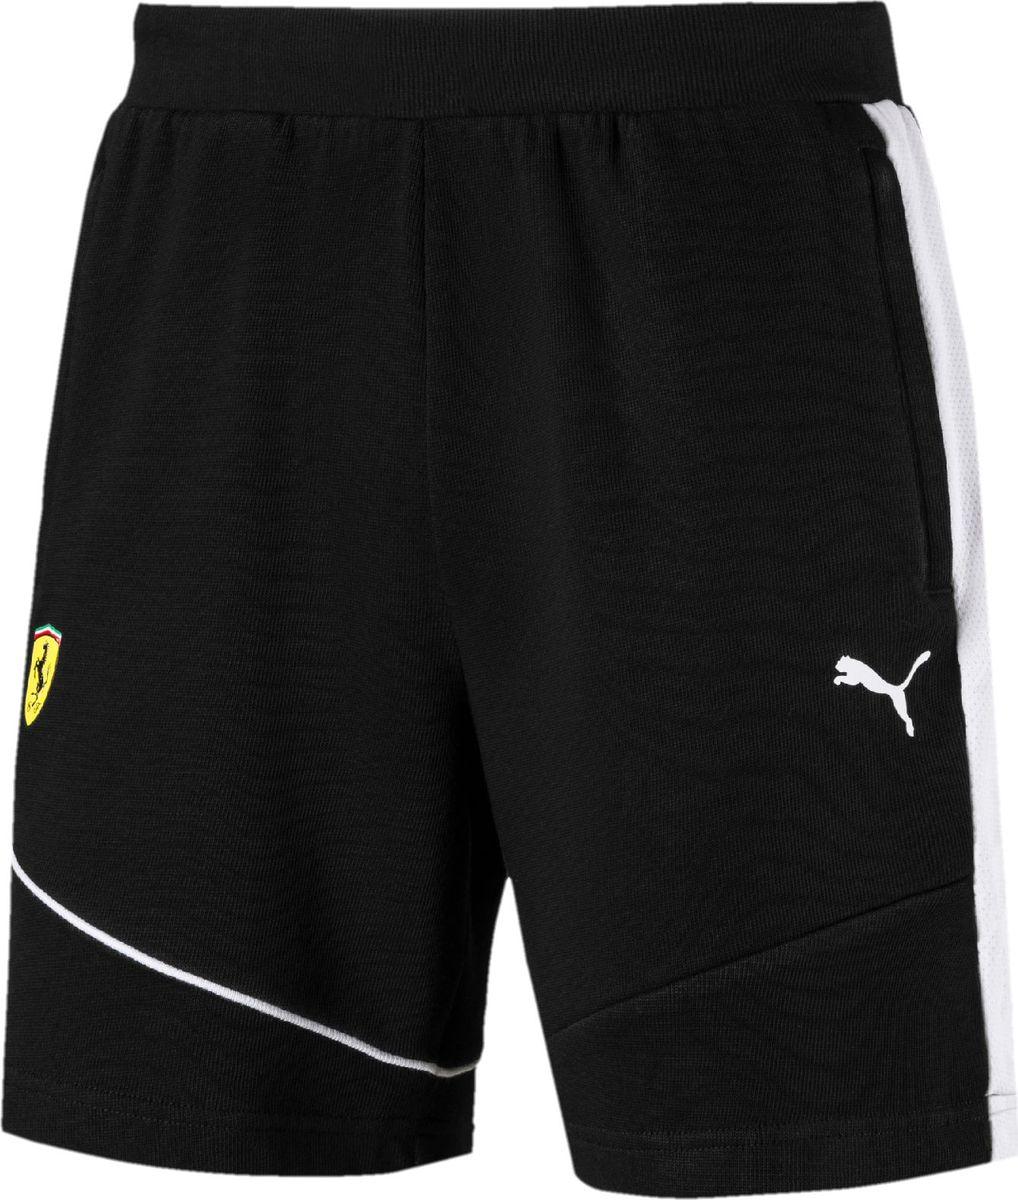 Шорты PUMA SF Sweat Shorts цены онлайн